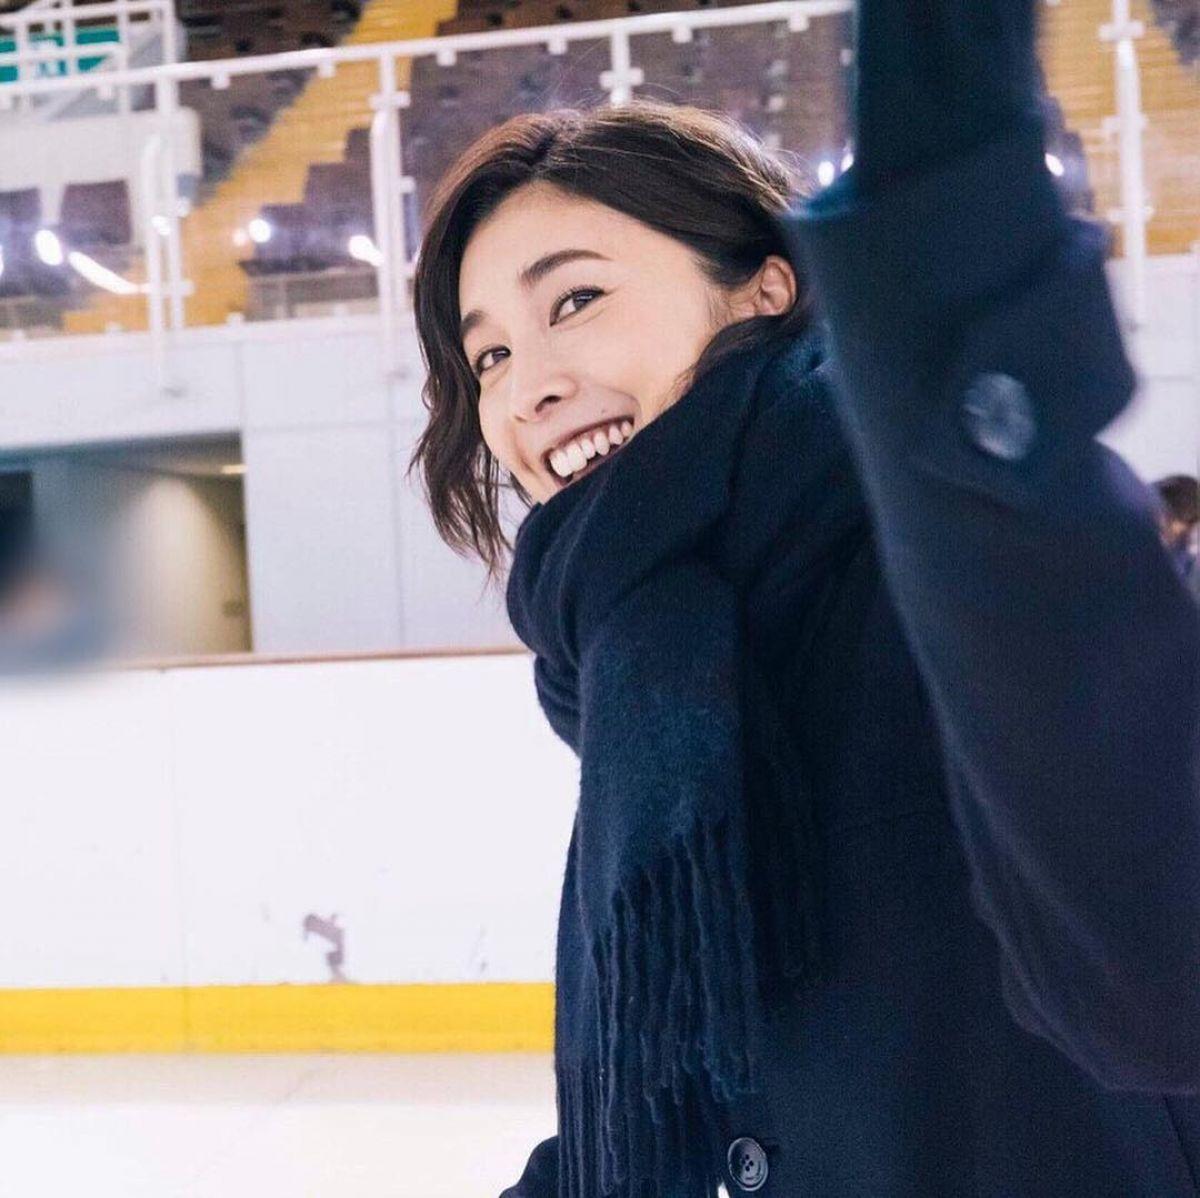 Japon aktris Yuko Takeuchi hayatını kaybetti #1